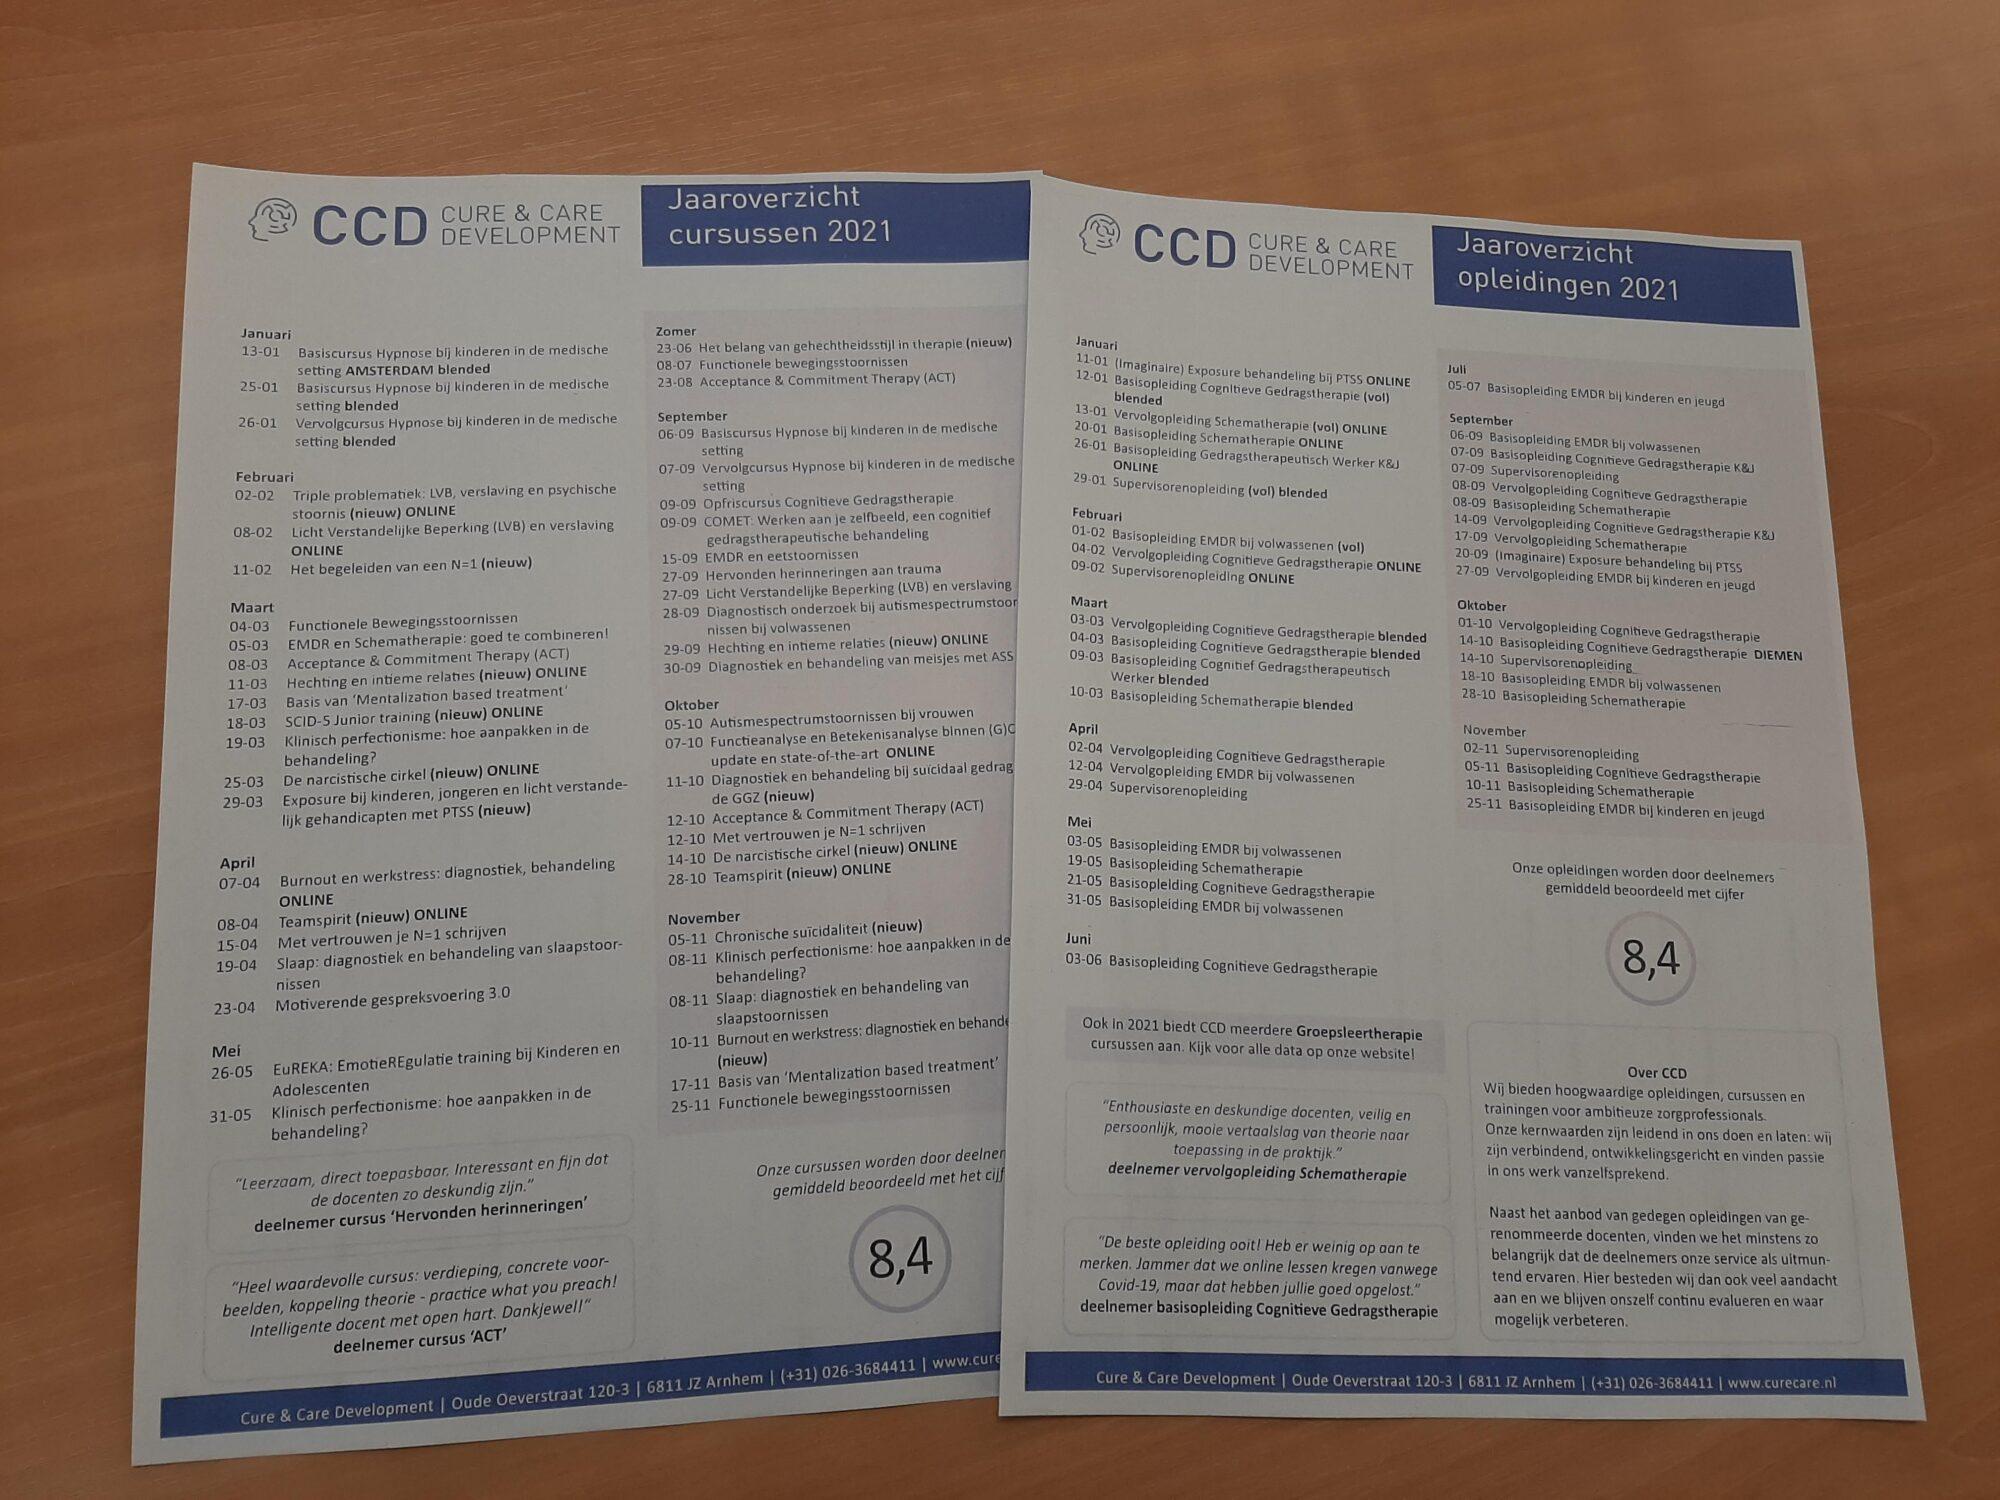 Jaaroverzicht CCD 2021